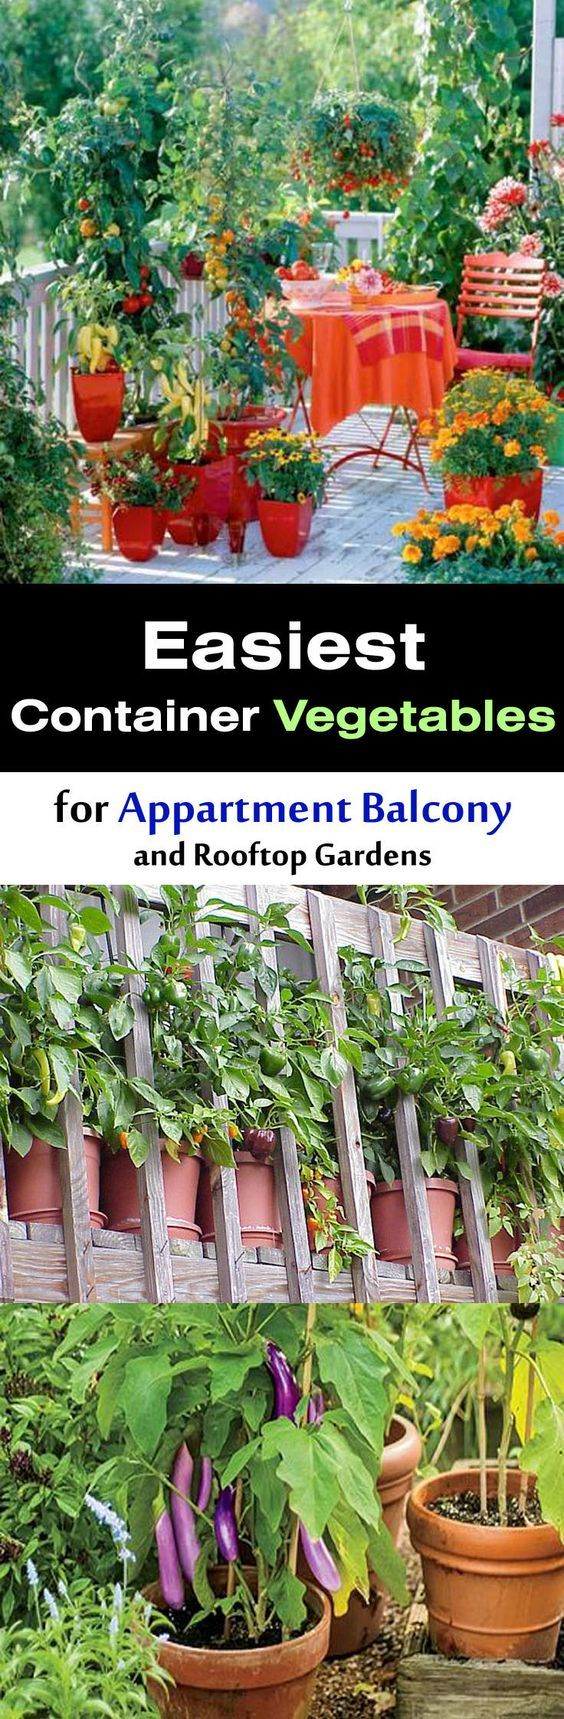 5201 Best Images About Garden On Pinterest Saving Seeds 400 x 300